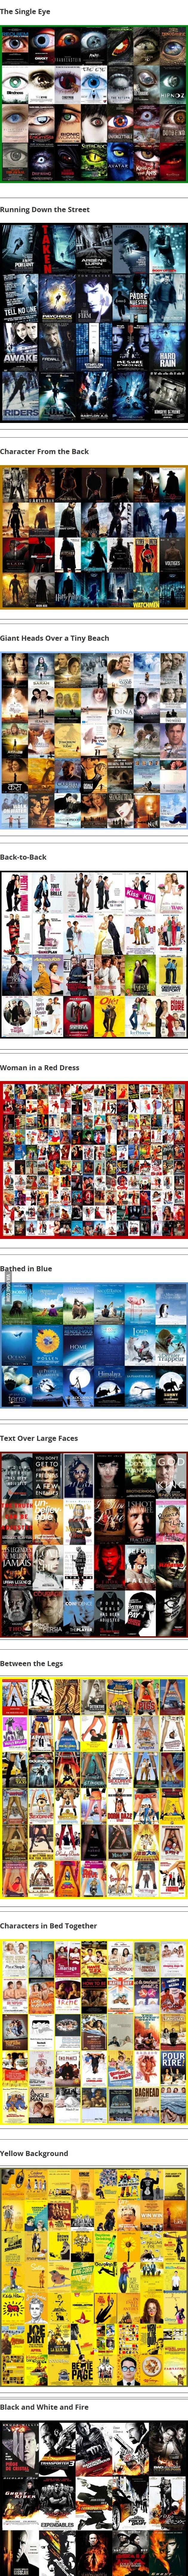 12 Movie Poster Cliches